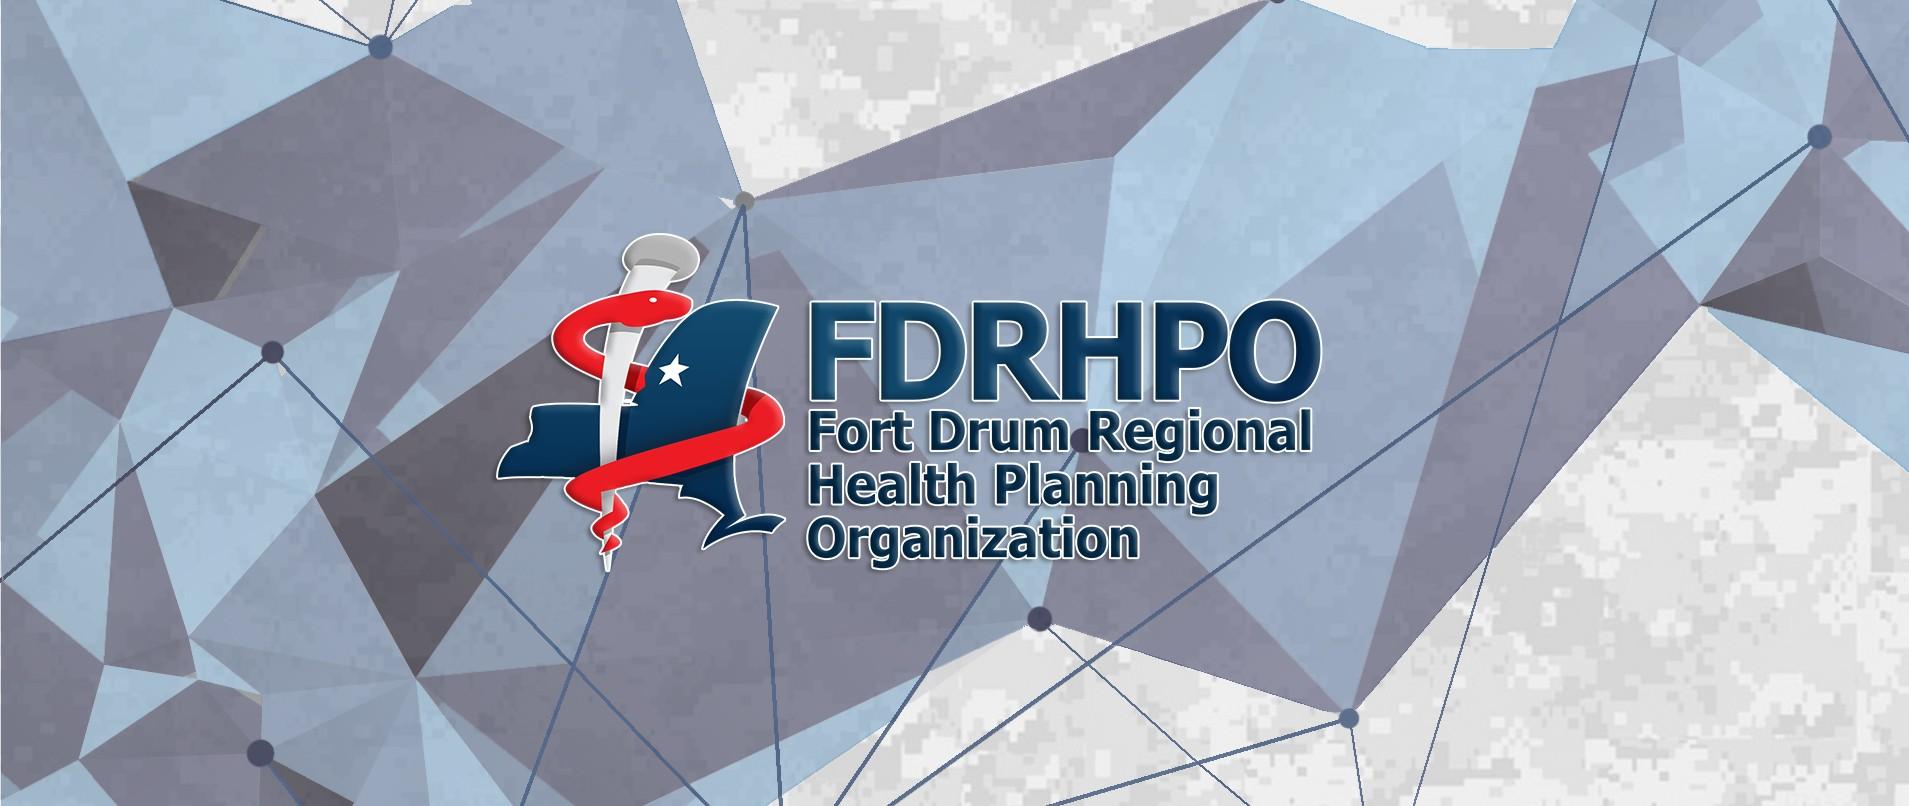 Fort Drum Regional Health Planning Organization   LinkedIn